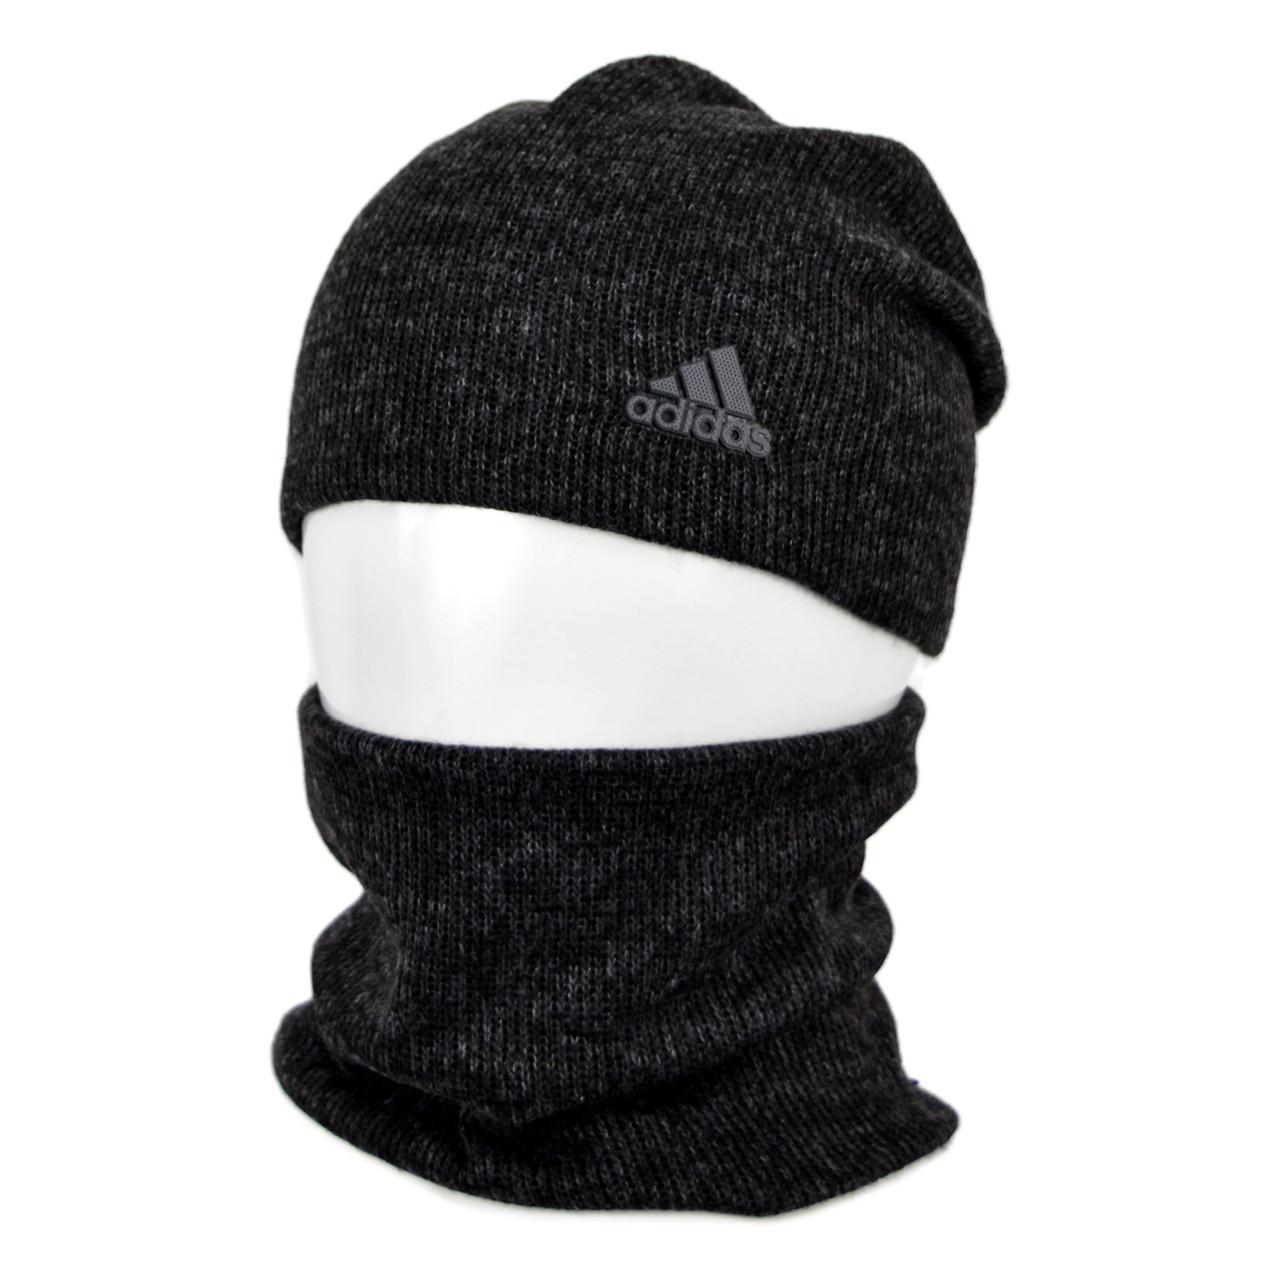 Комплект шапка+баф adidas SP1901 черный